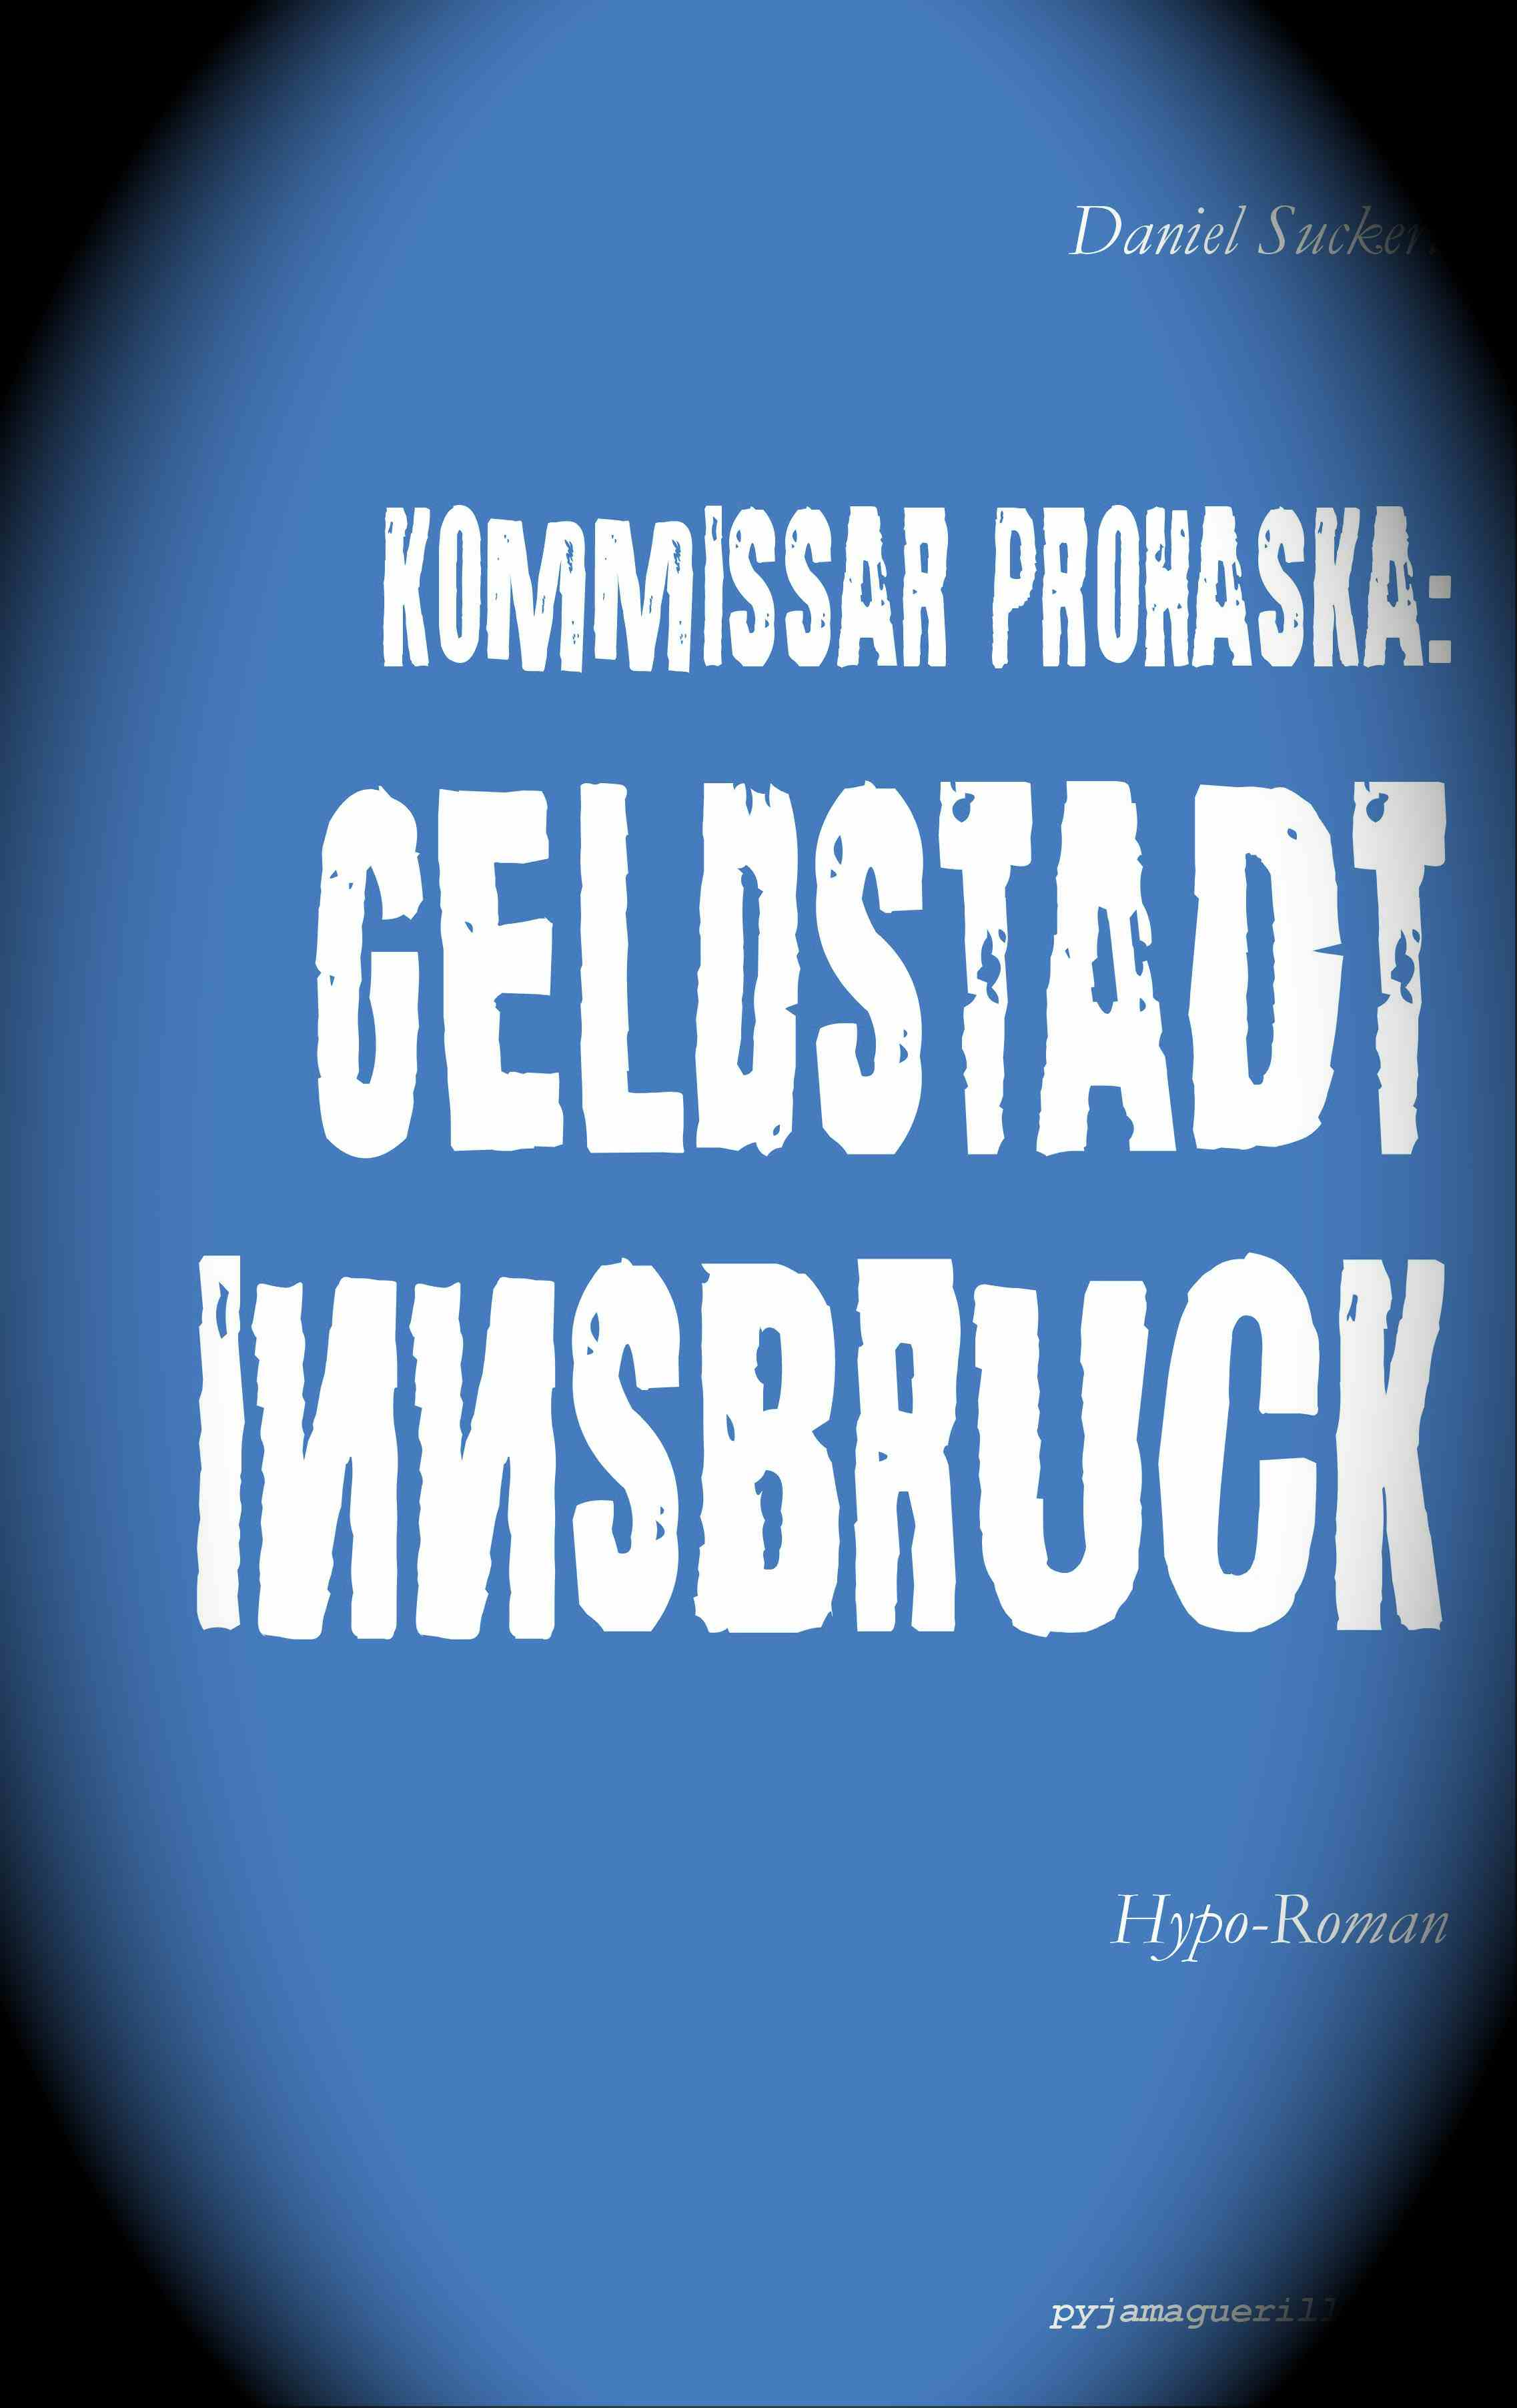 COVER-Himmelblau